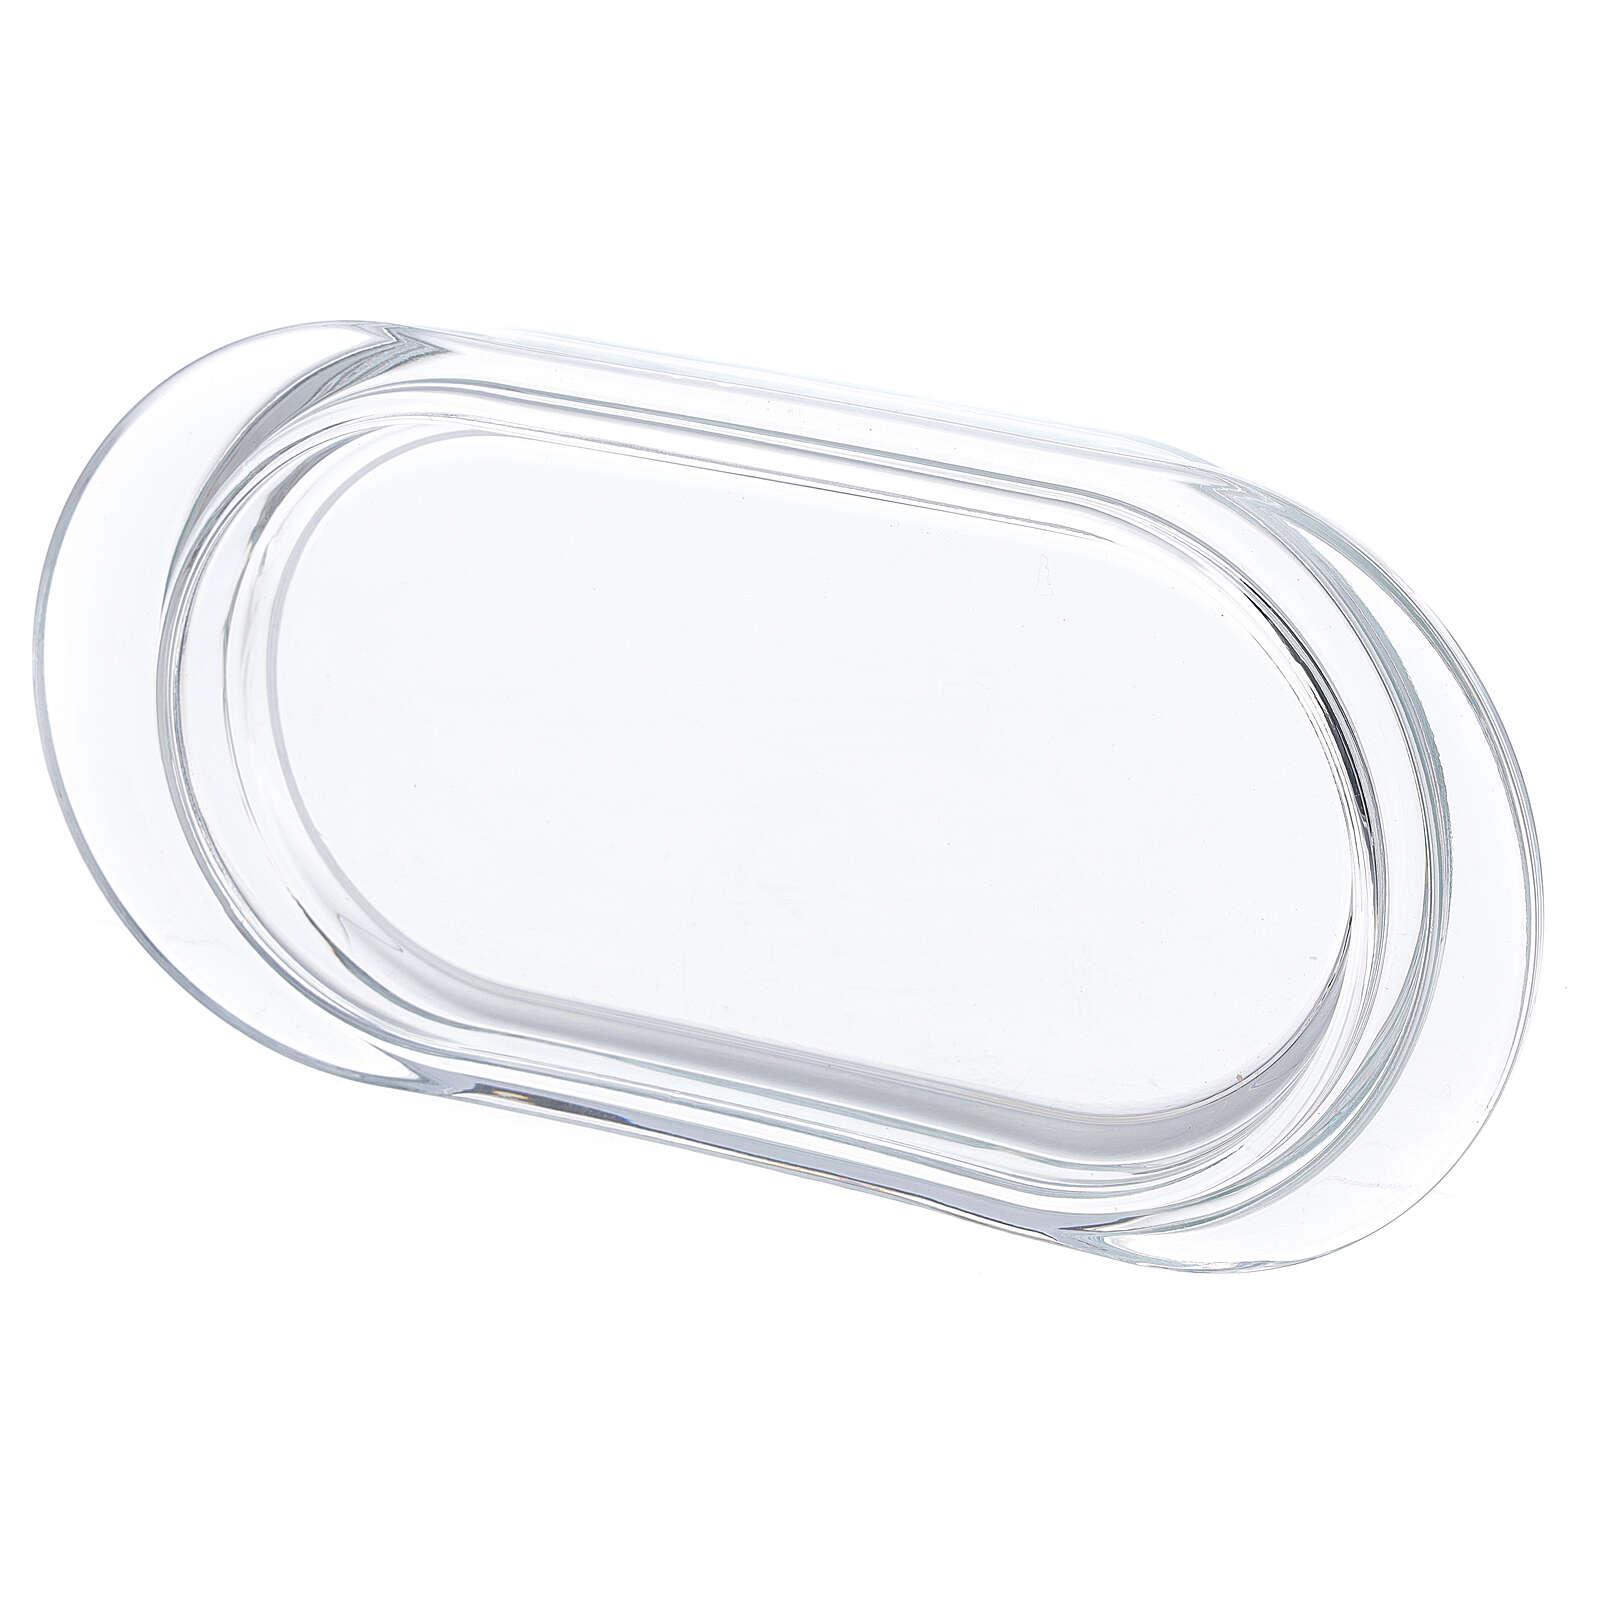 Parma cruet set with glass tray 75 ml 4